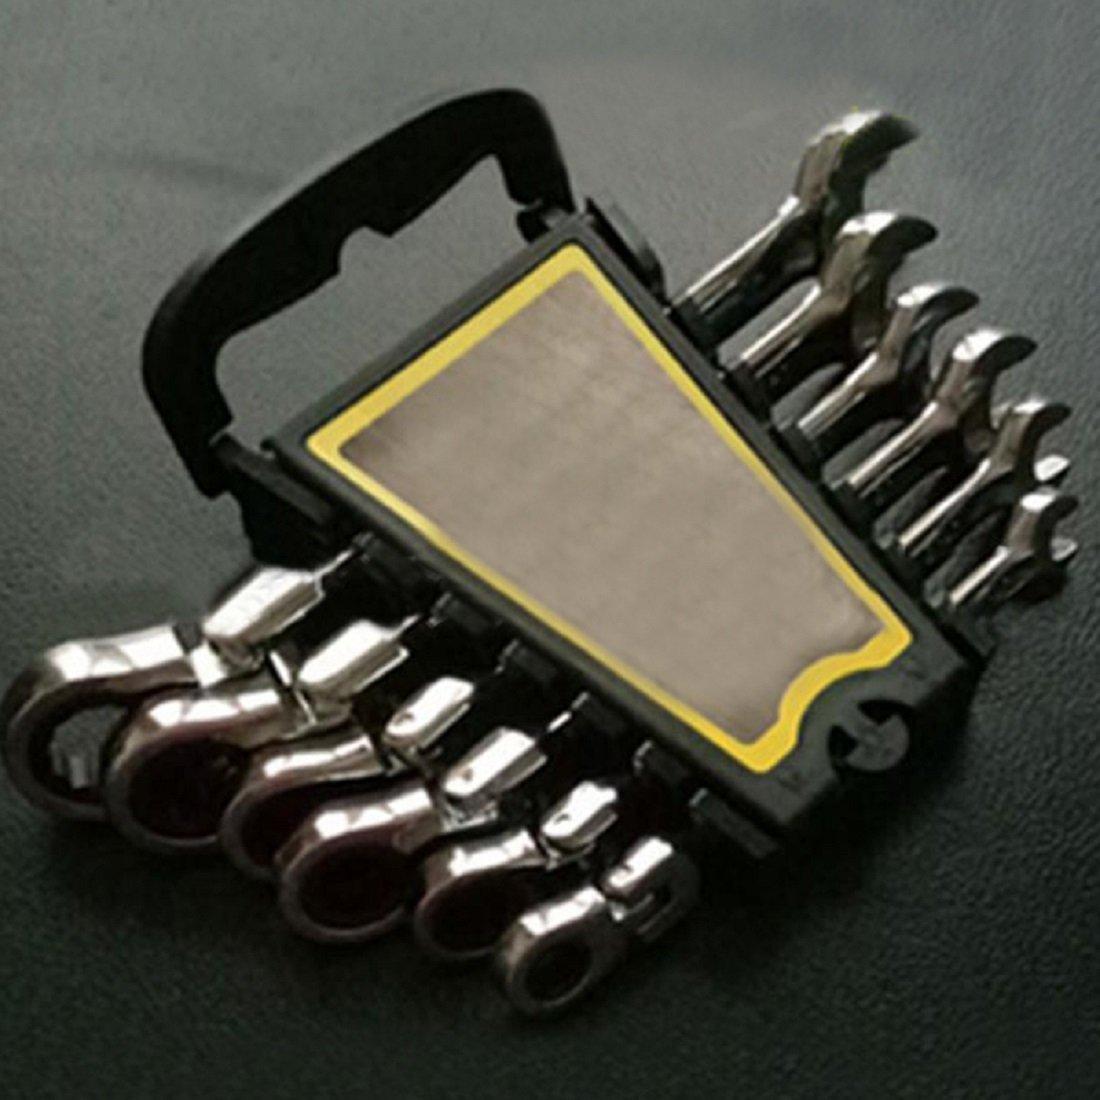 7MM Chartsea Flexible Pivoting Head Ratchet Combination Spanner Wrench Garage Metric Tool 6mm-12mm